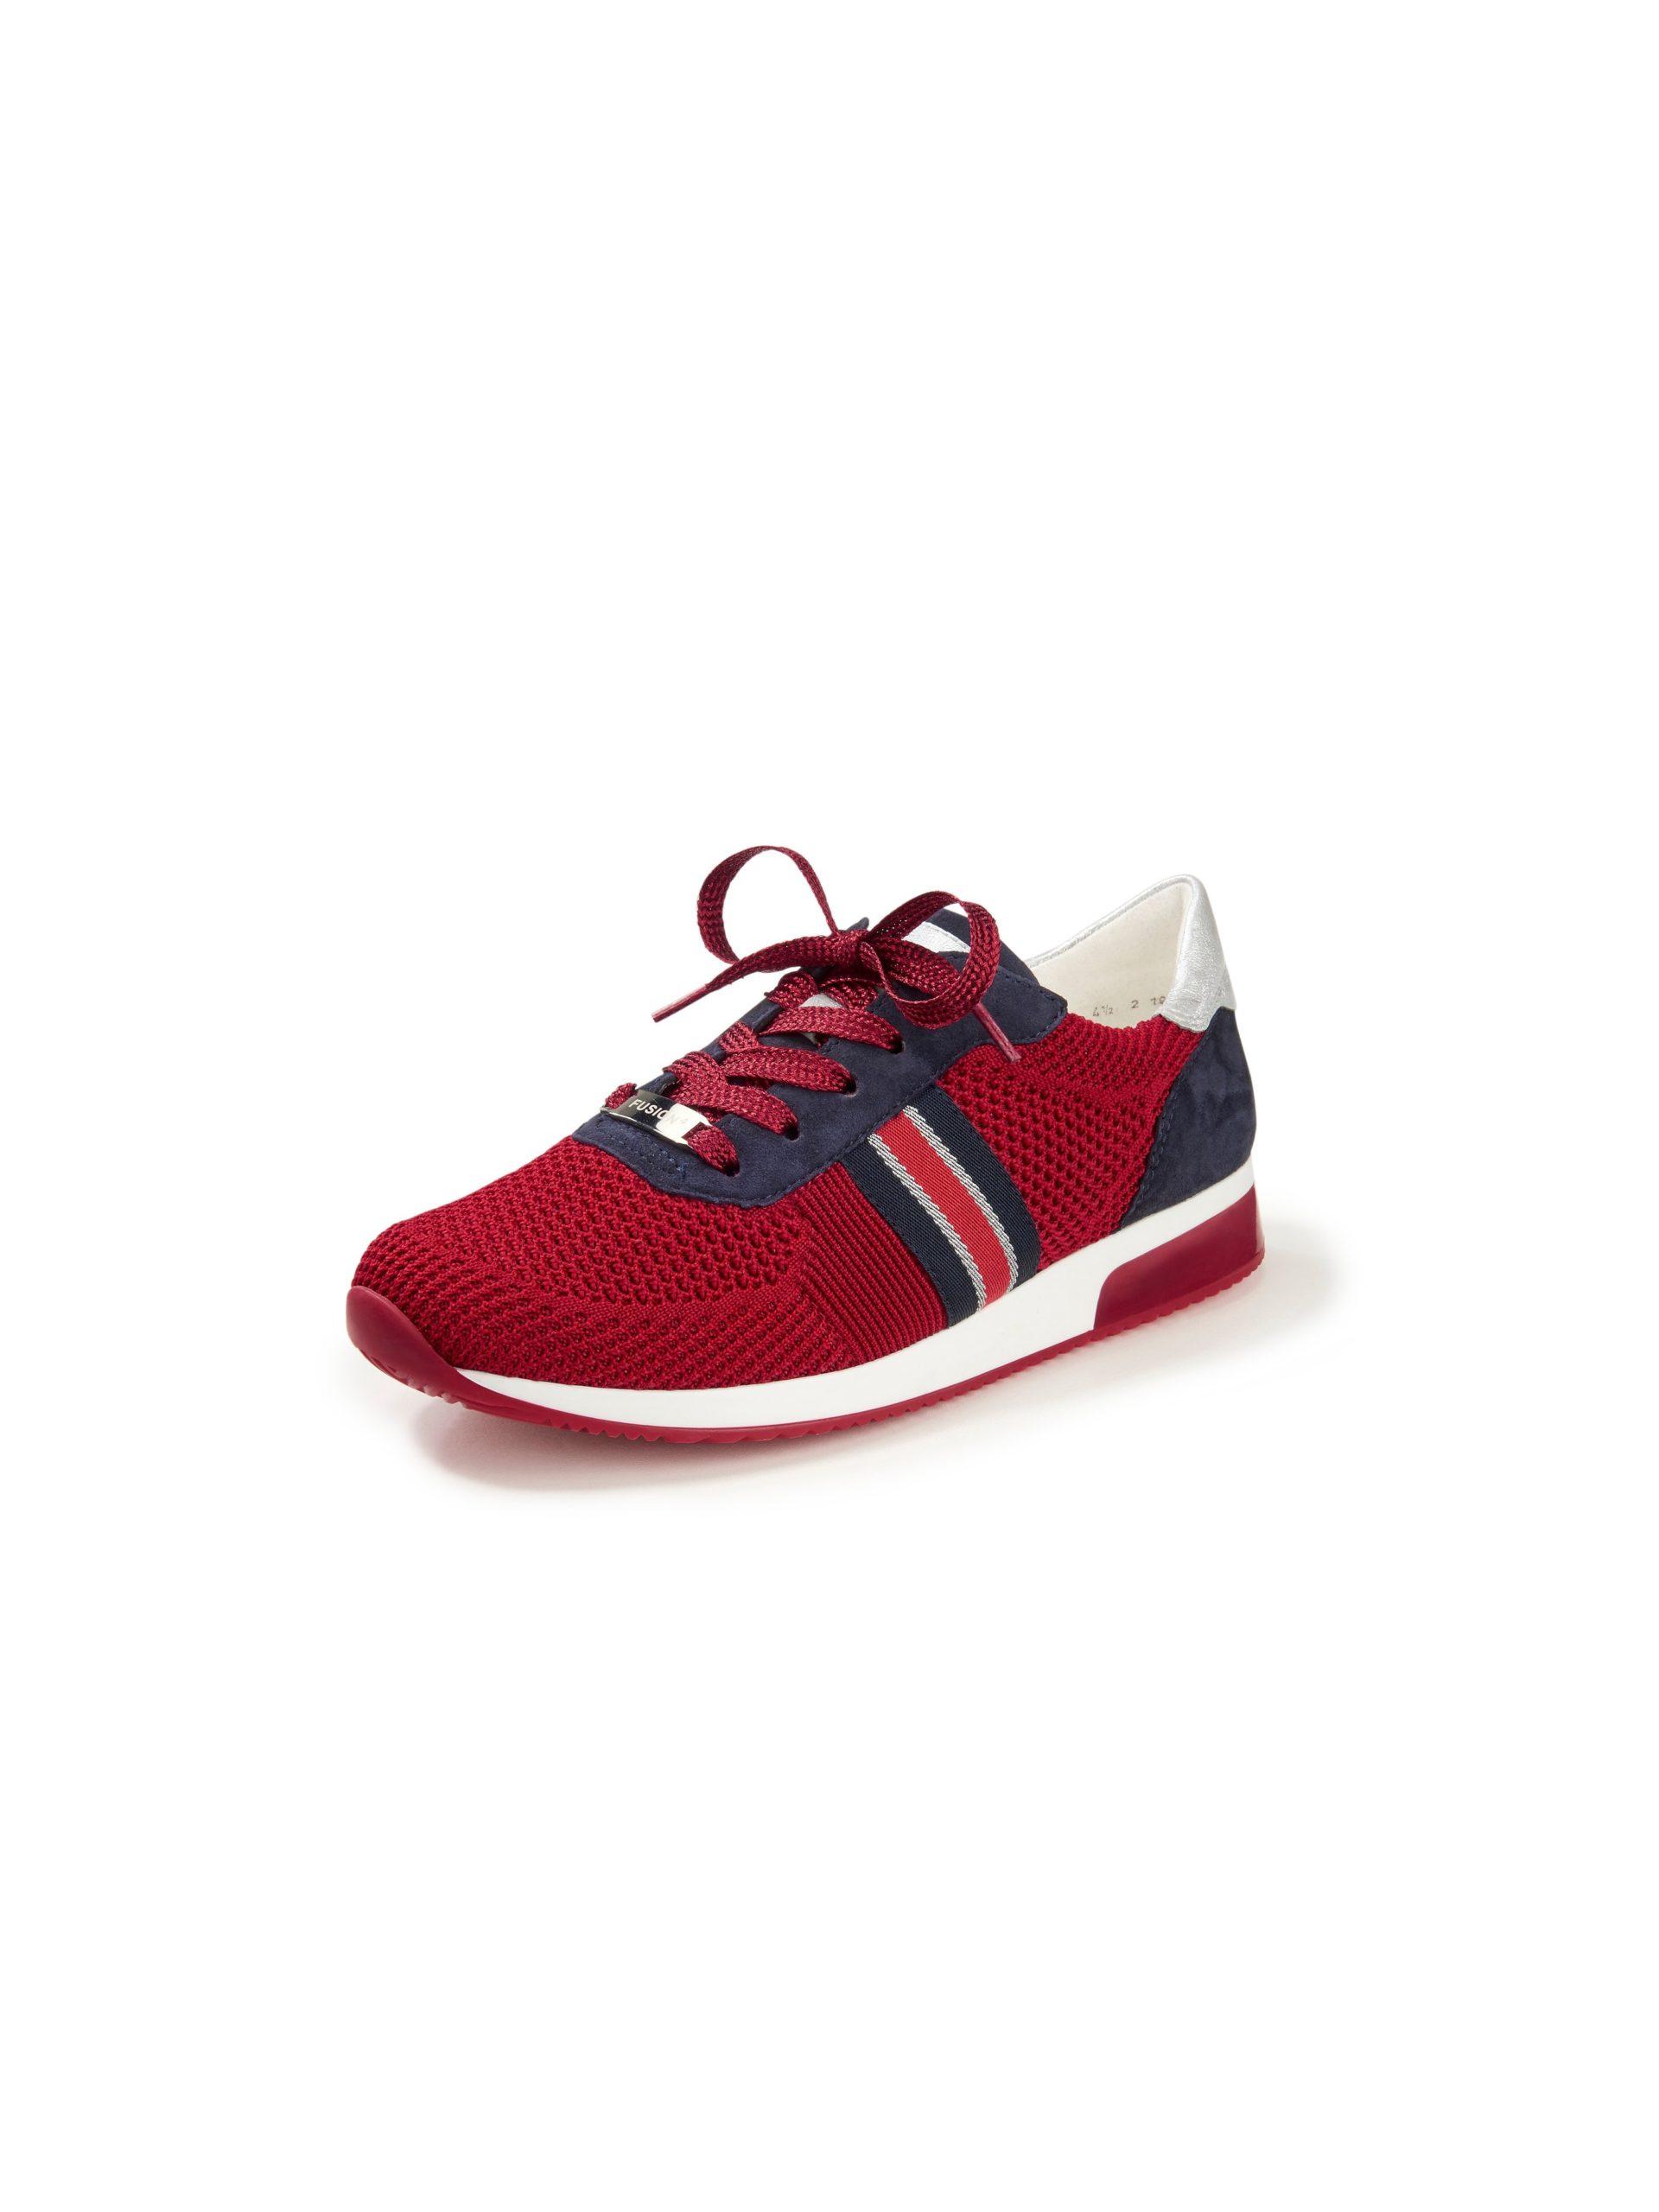 Sneakers Lissabon Fusion4 van textielmateriaal Van ARA rood Kopen